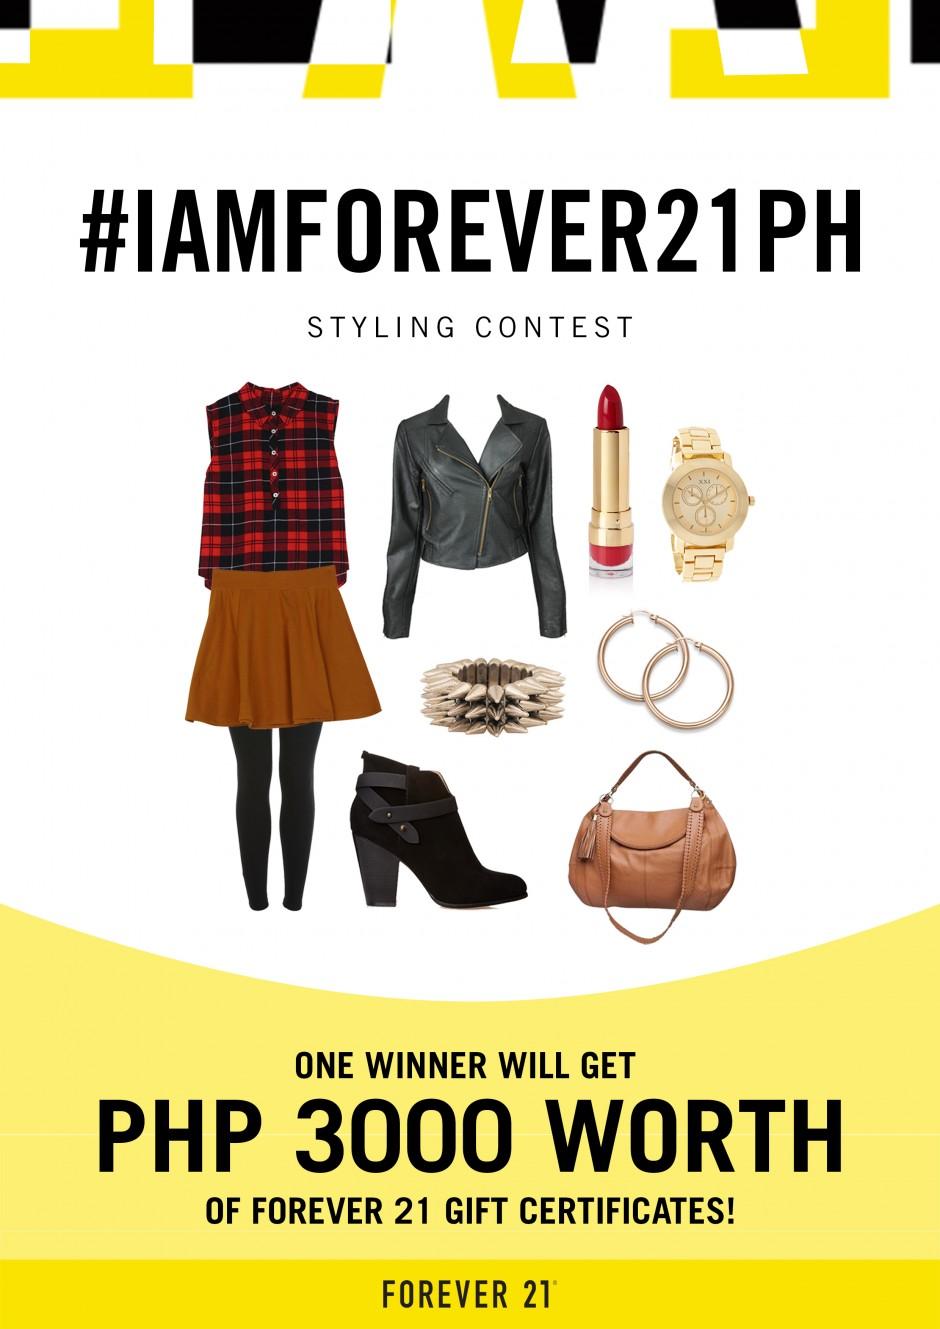 #IAmForever21PH Styling Contest Poster